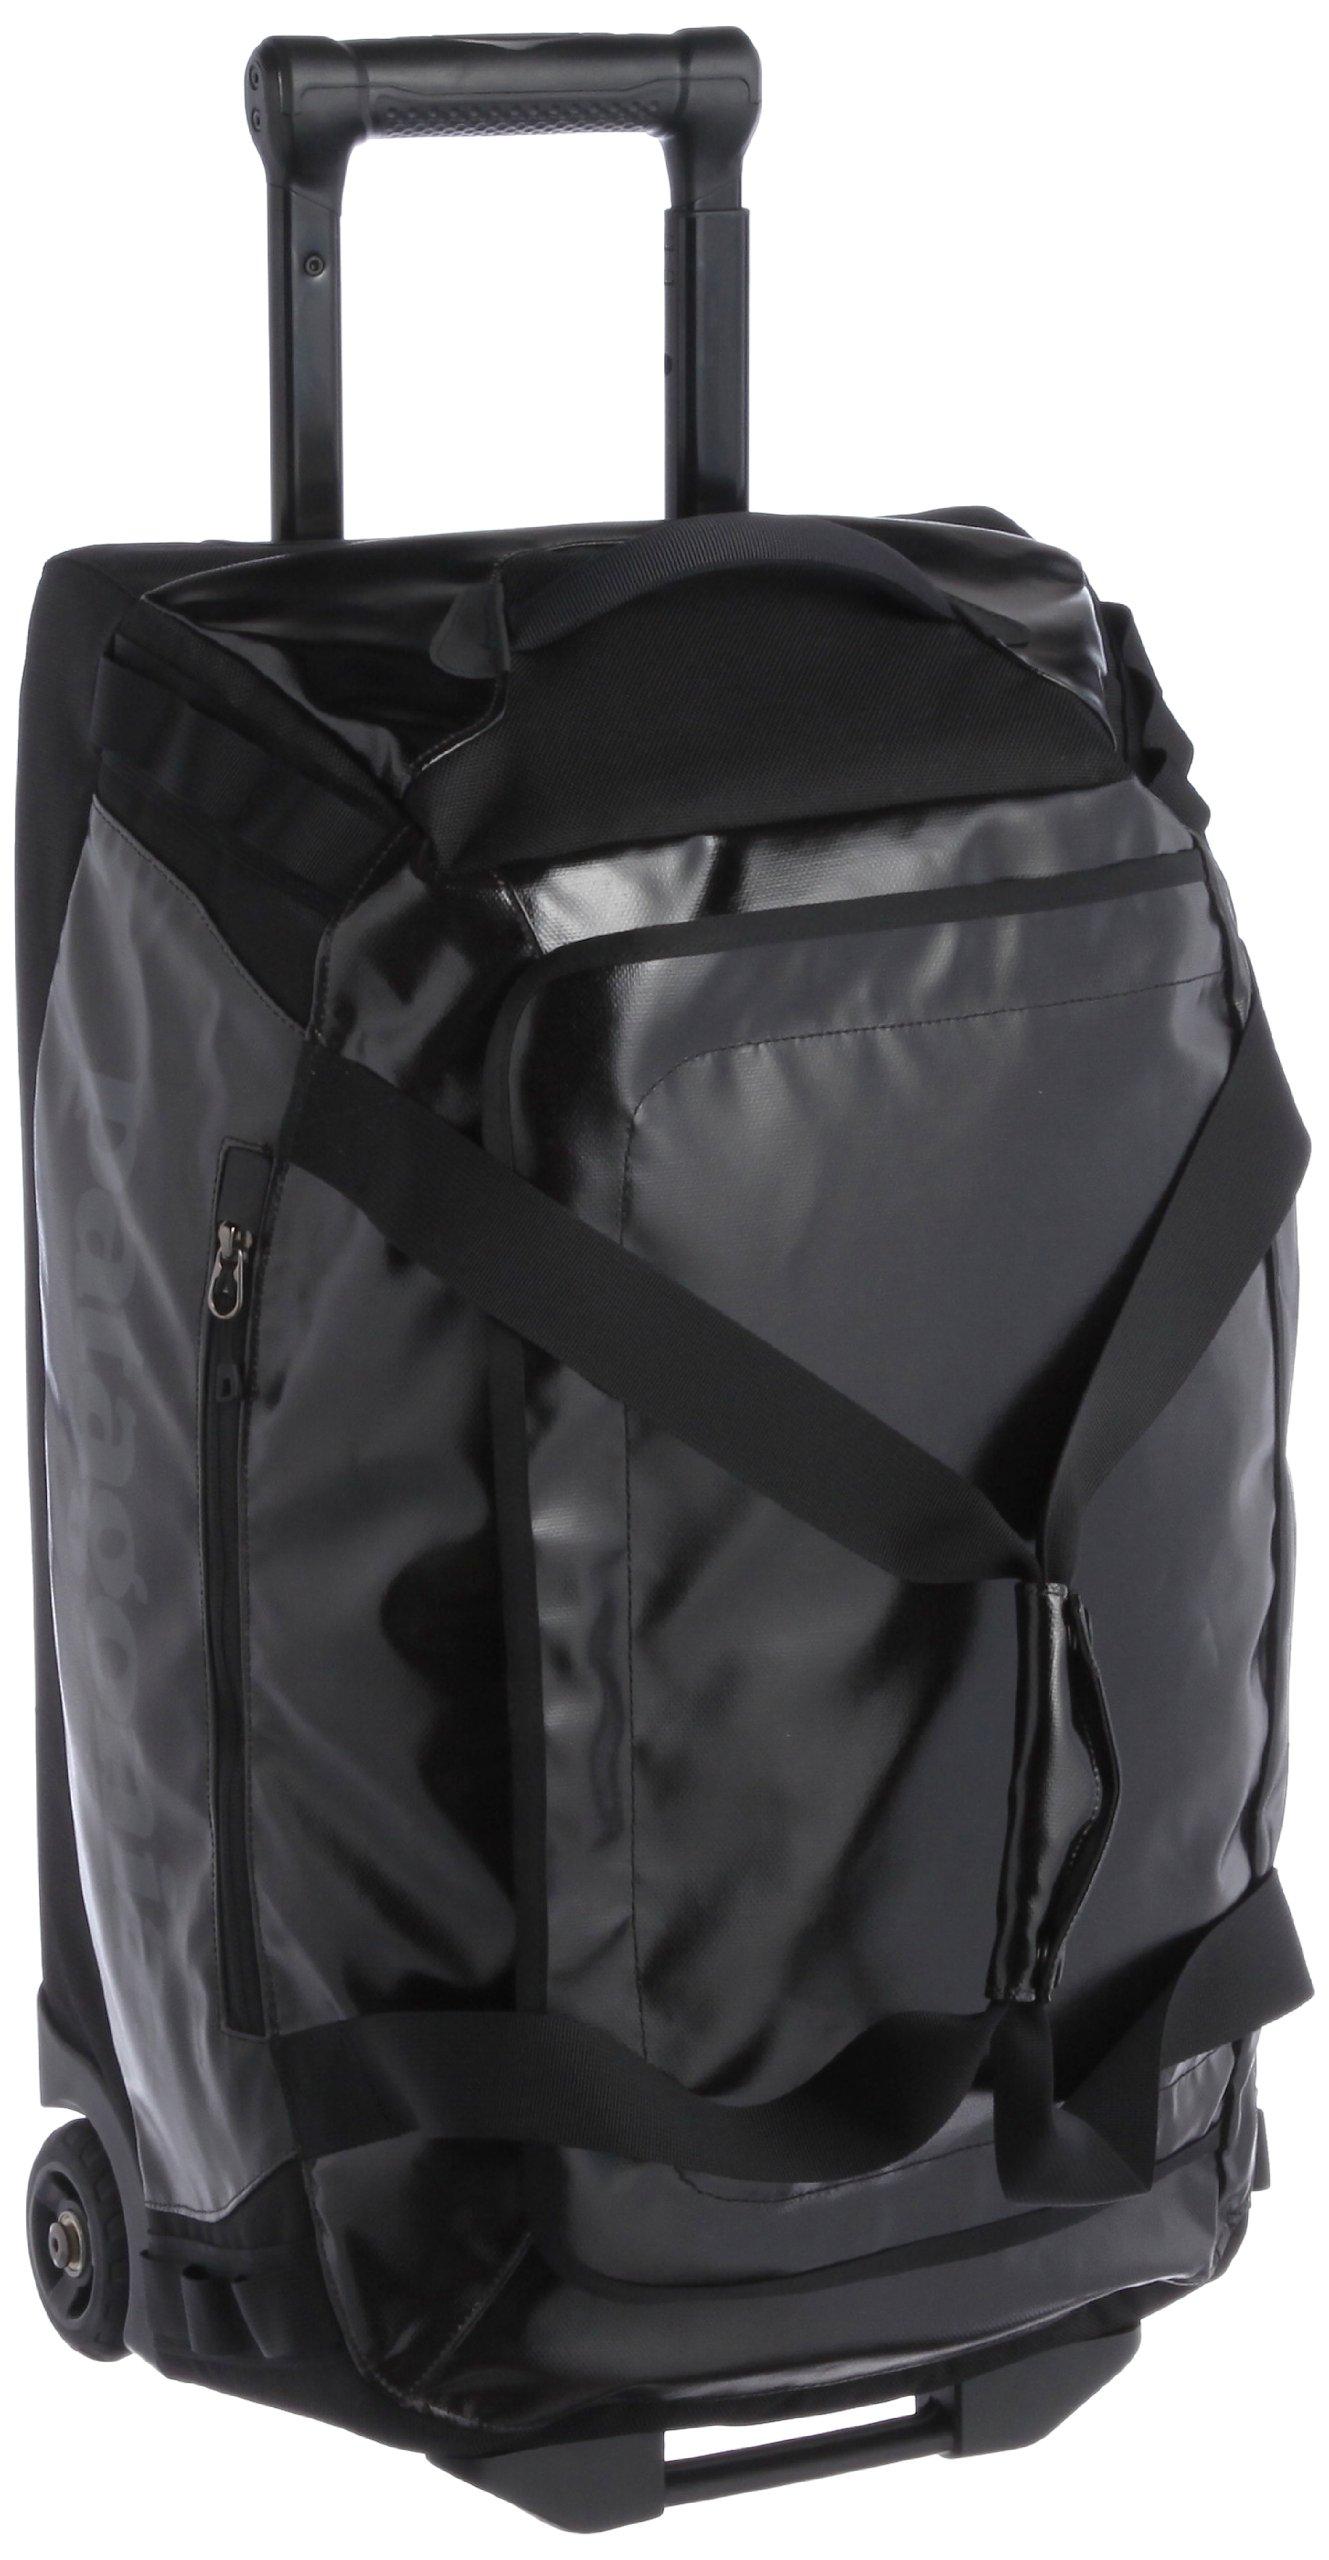 d9daee6a82 Get Quotations · Patagonia Black Hole Wheeled Duffel 45L Duffel Bag Black